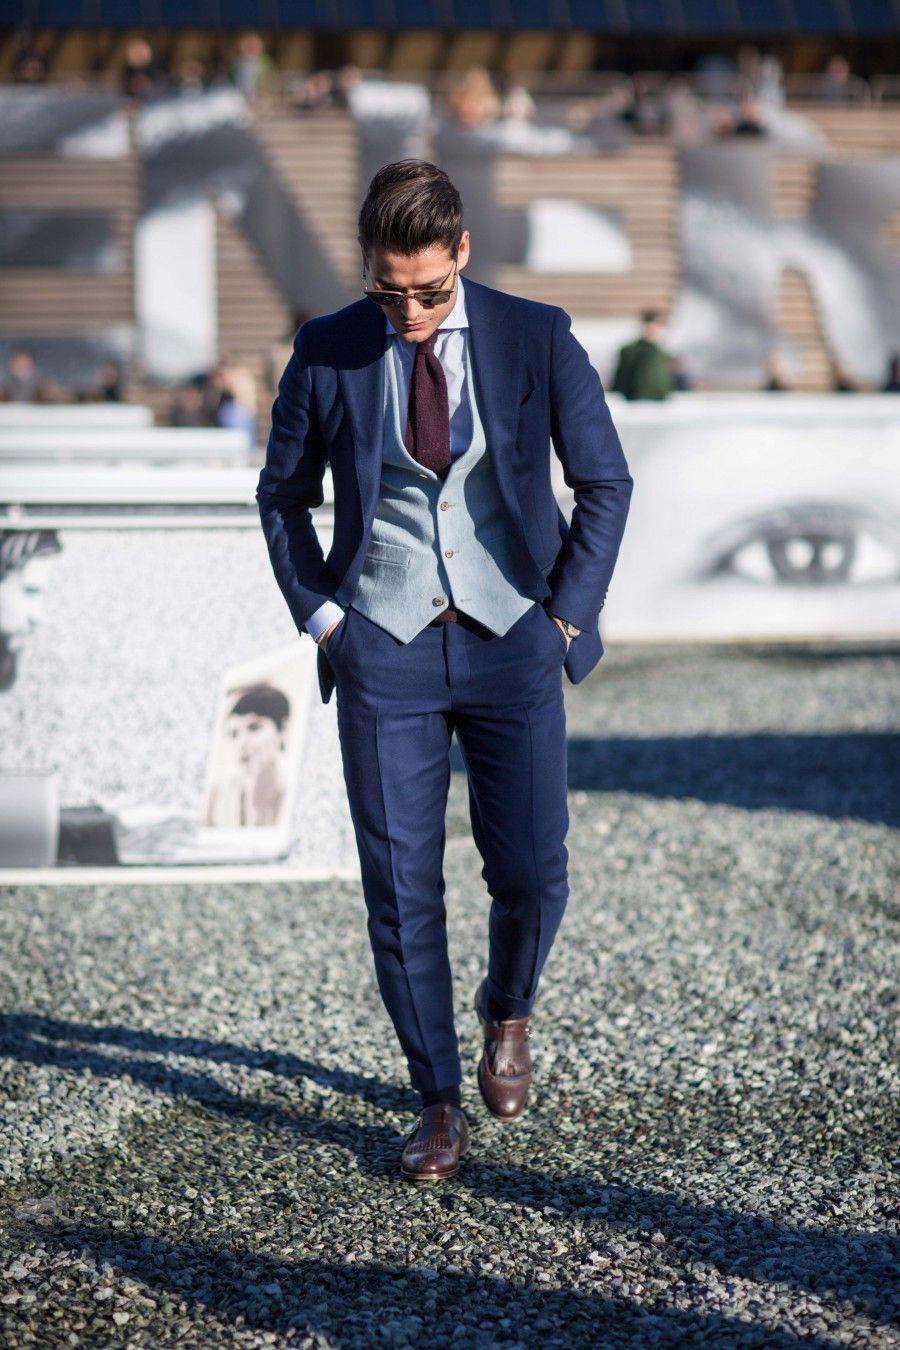 Frank Gallucci (Street Style Ph. by Federico Avanzini)